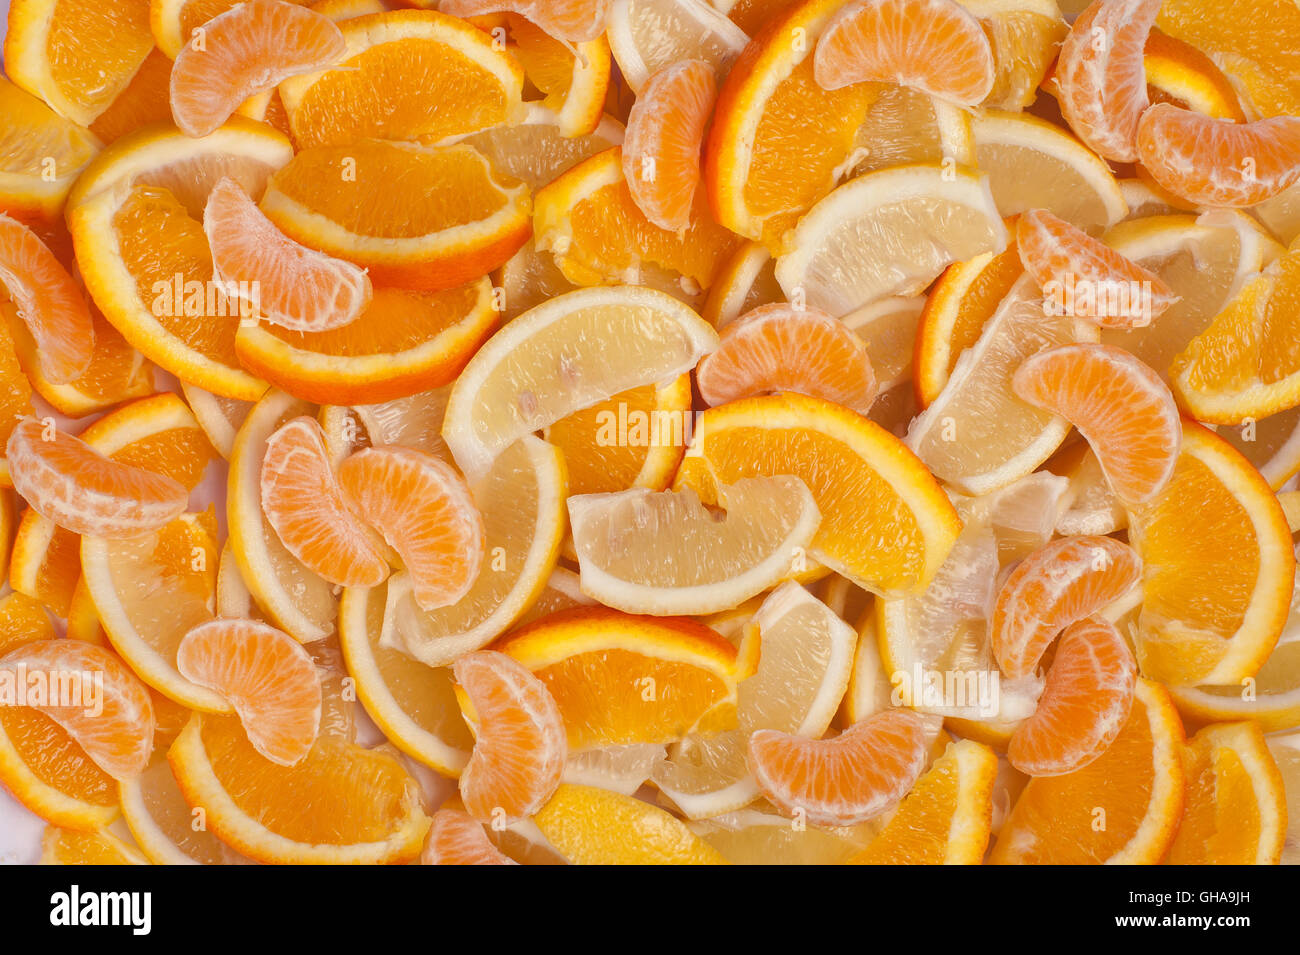 Fondos de frutas: Naranja, Limón y mandarina Imagen De Stock